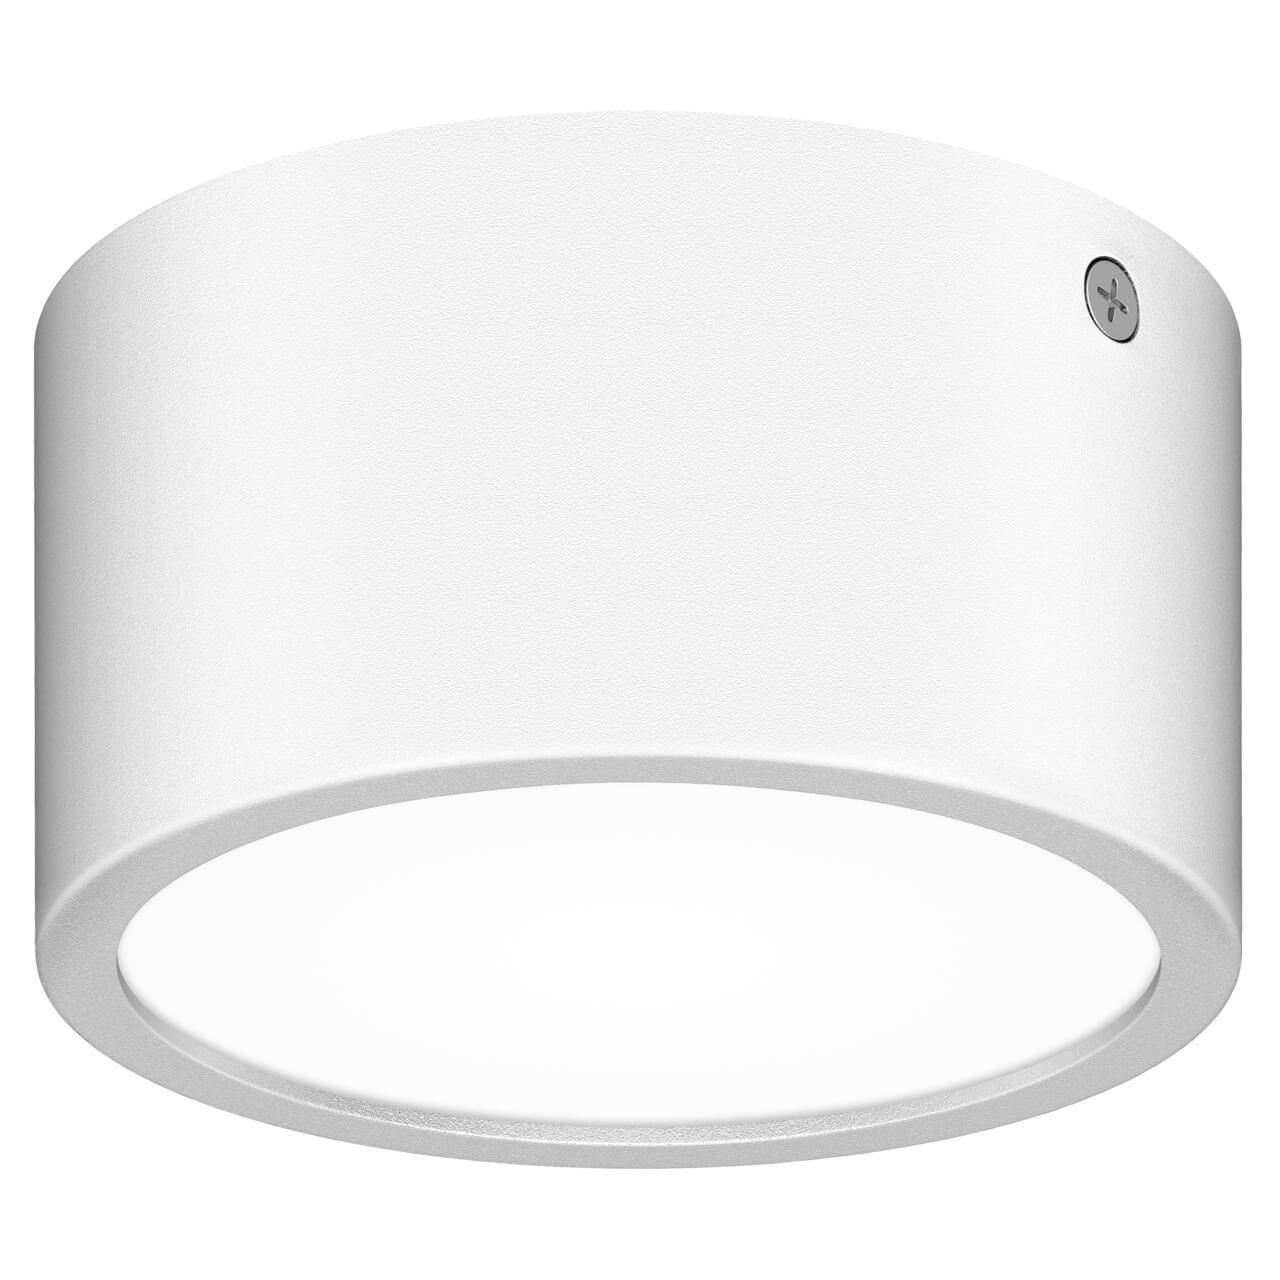 Уличный светодиодный светильник Lightstar Zolla 380164